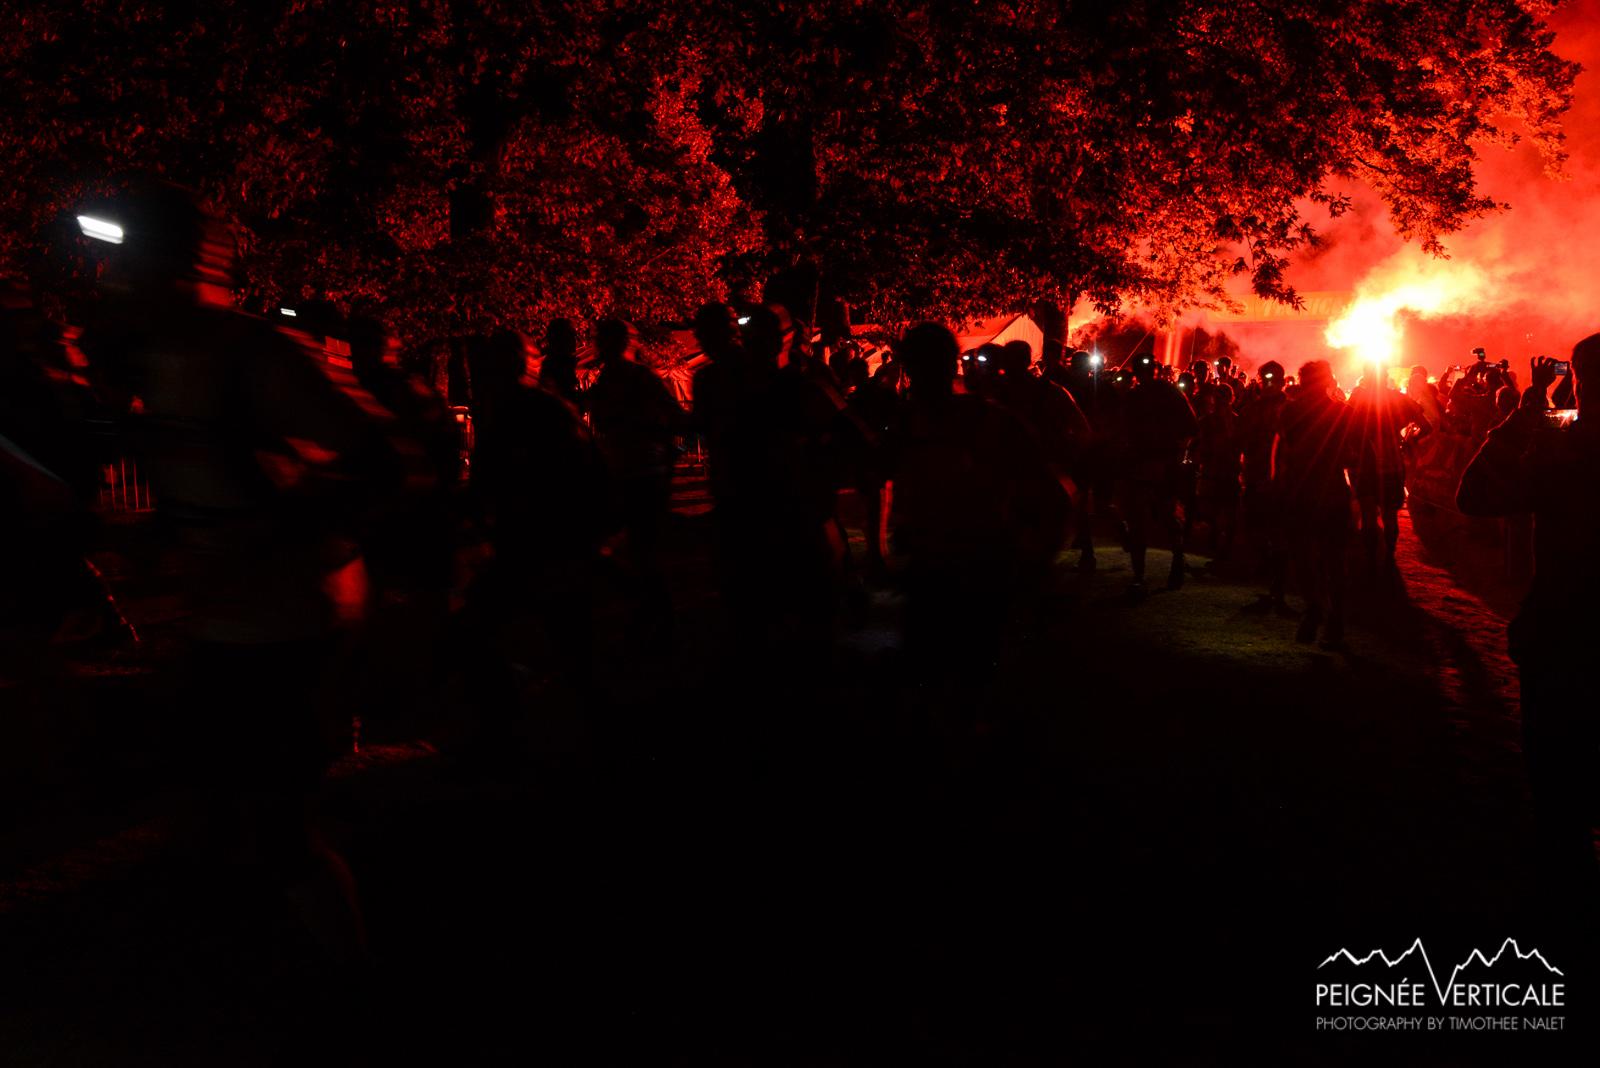 MaxiRace-Annecy-2014-Team-Hoka-Timothee-Nalet-0627.jpg